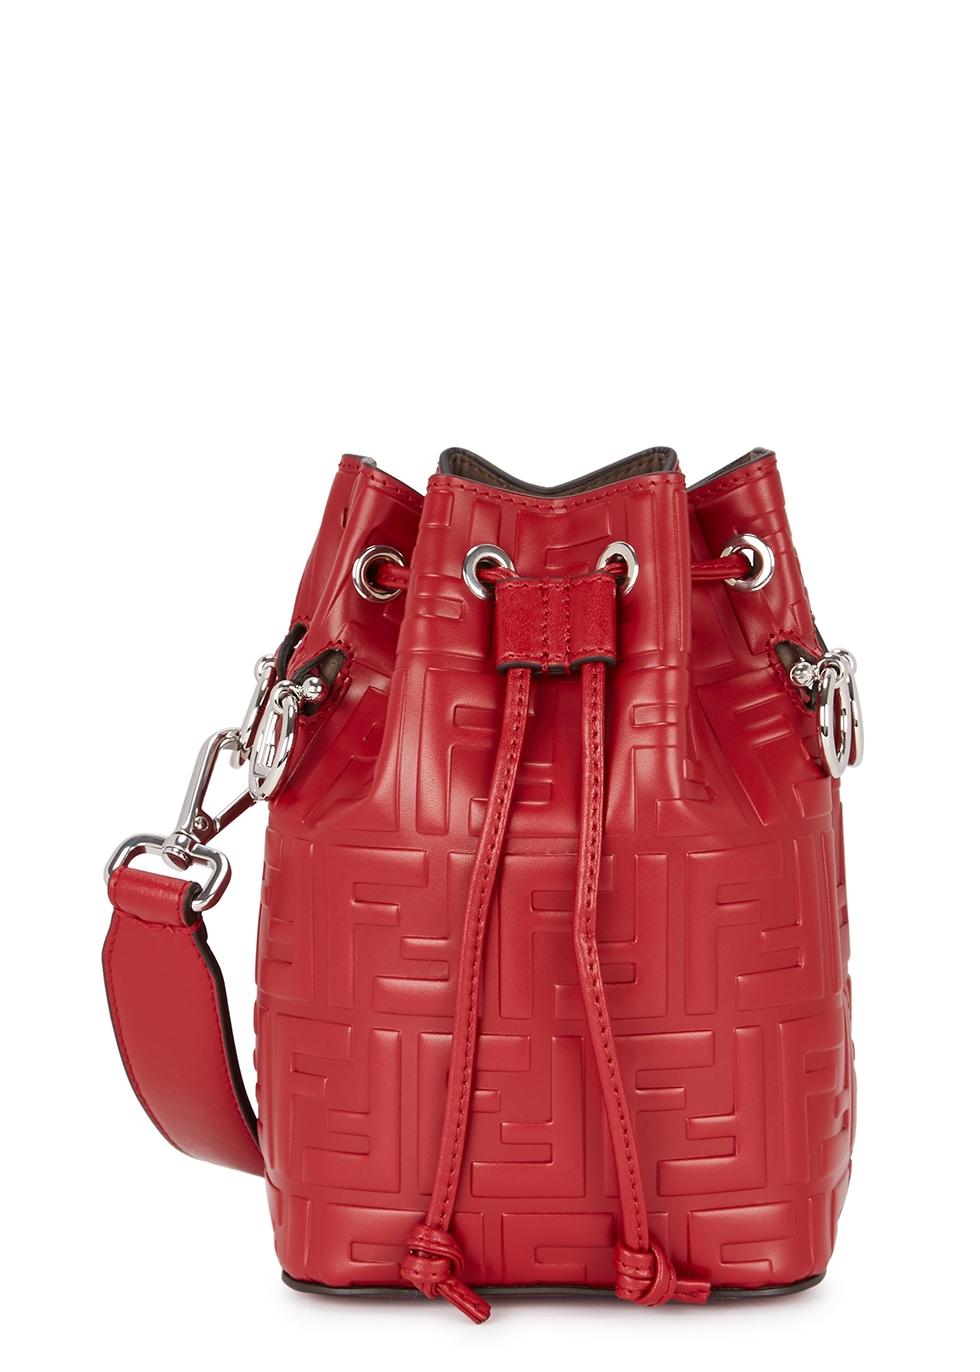 Monosori red leather bucket bag - Fendi